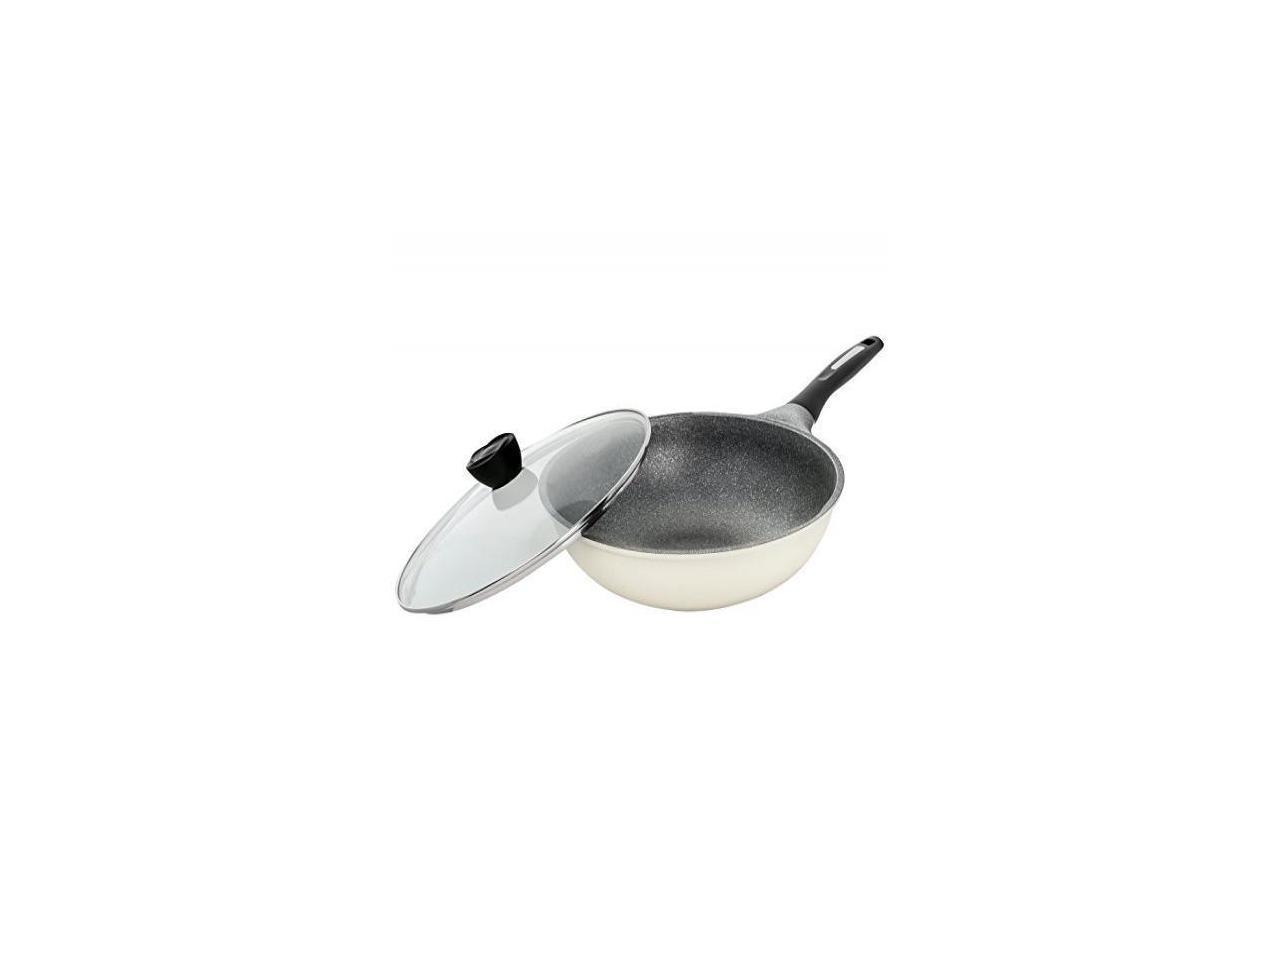 Concord Premium Inoble Coated Ultra Non Stick Wok Deep Frying Pan Cookware Set Antique White Newegg Com